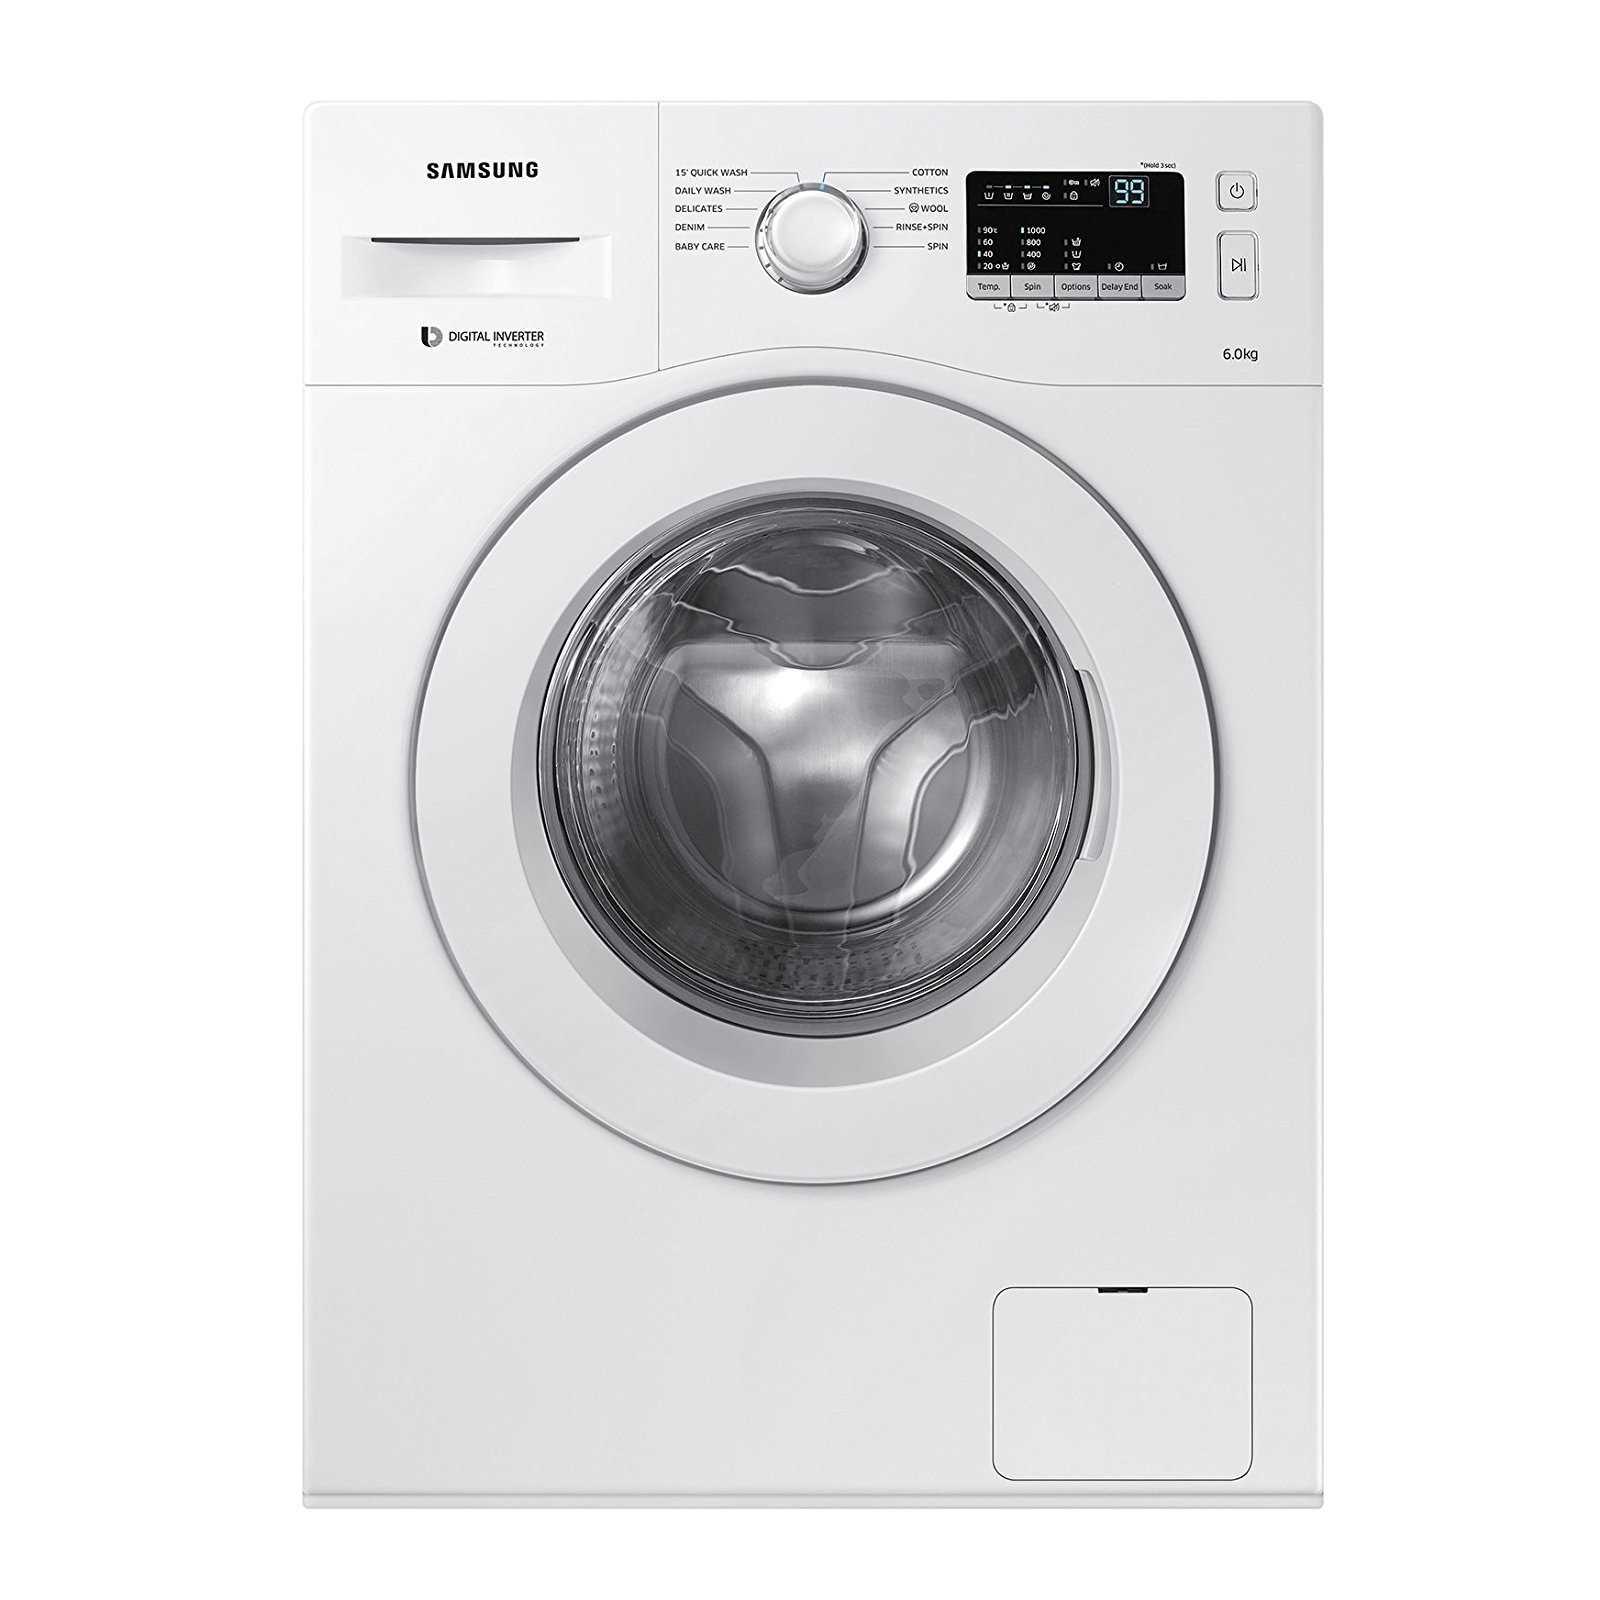 Samsung WW60M206LMW TL 6 Kg Fully Automatic Front Loading Washing Machine